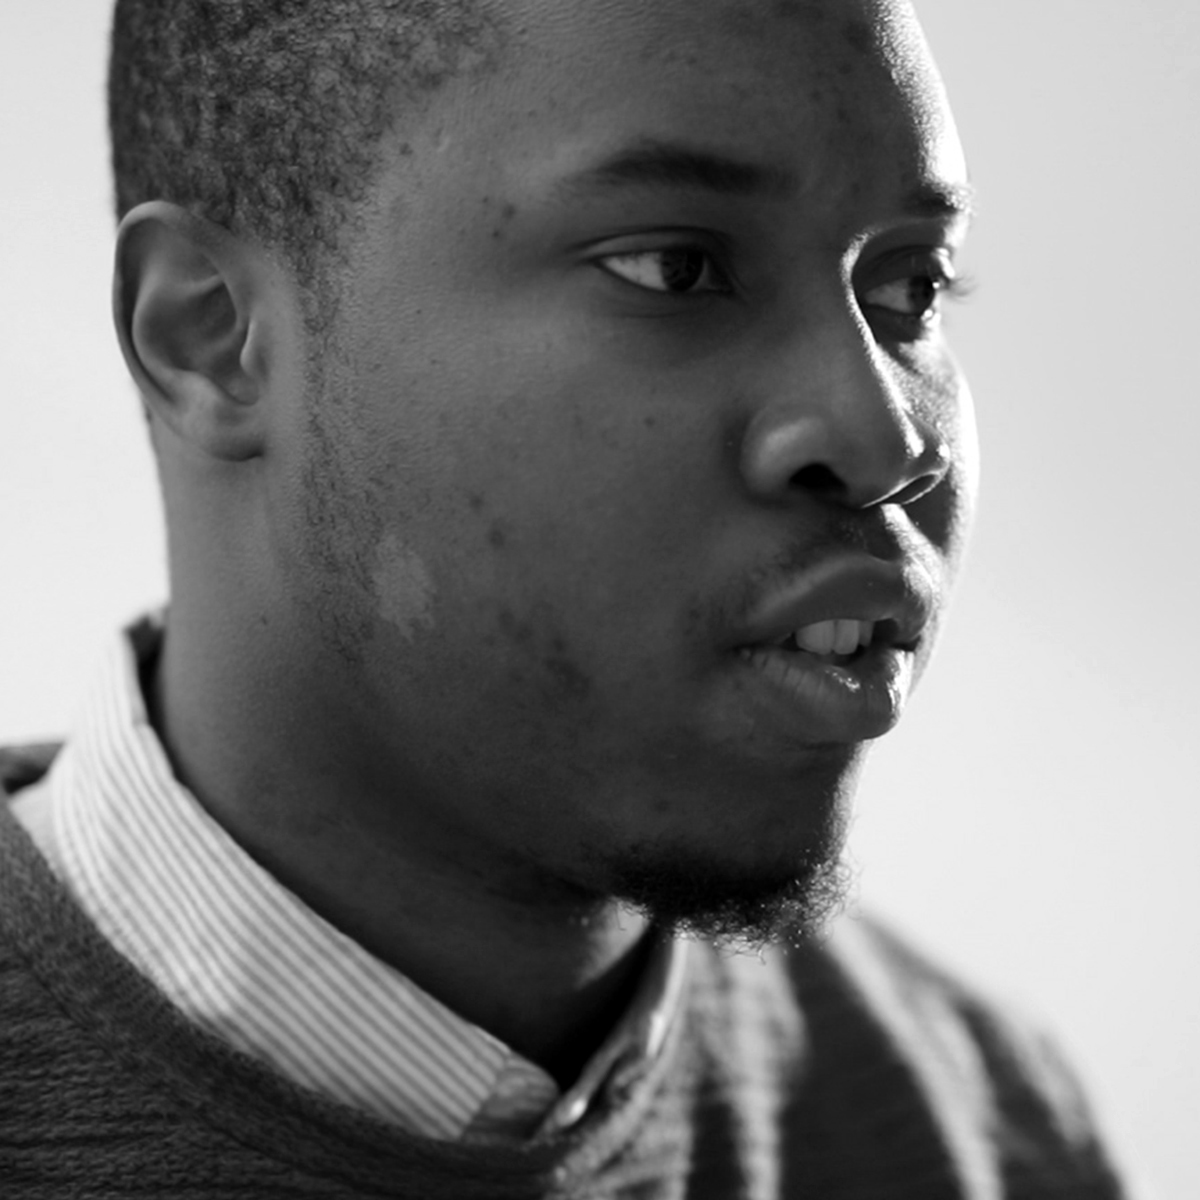 Setor Tsikudo, Accountant/Photographer